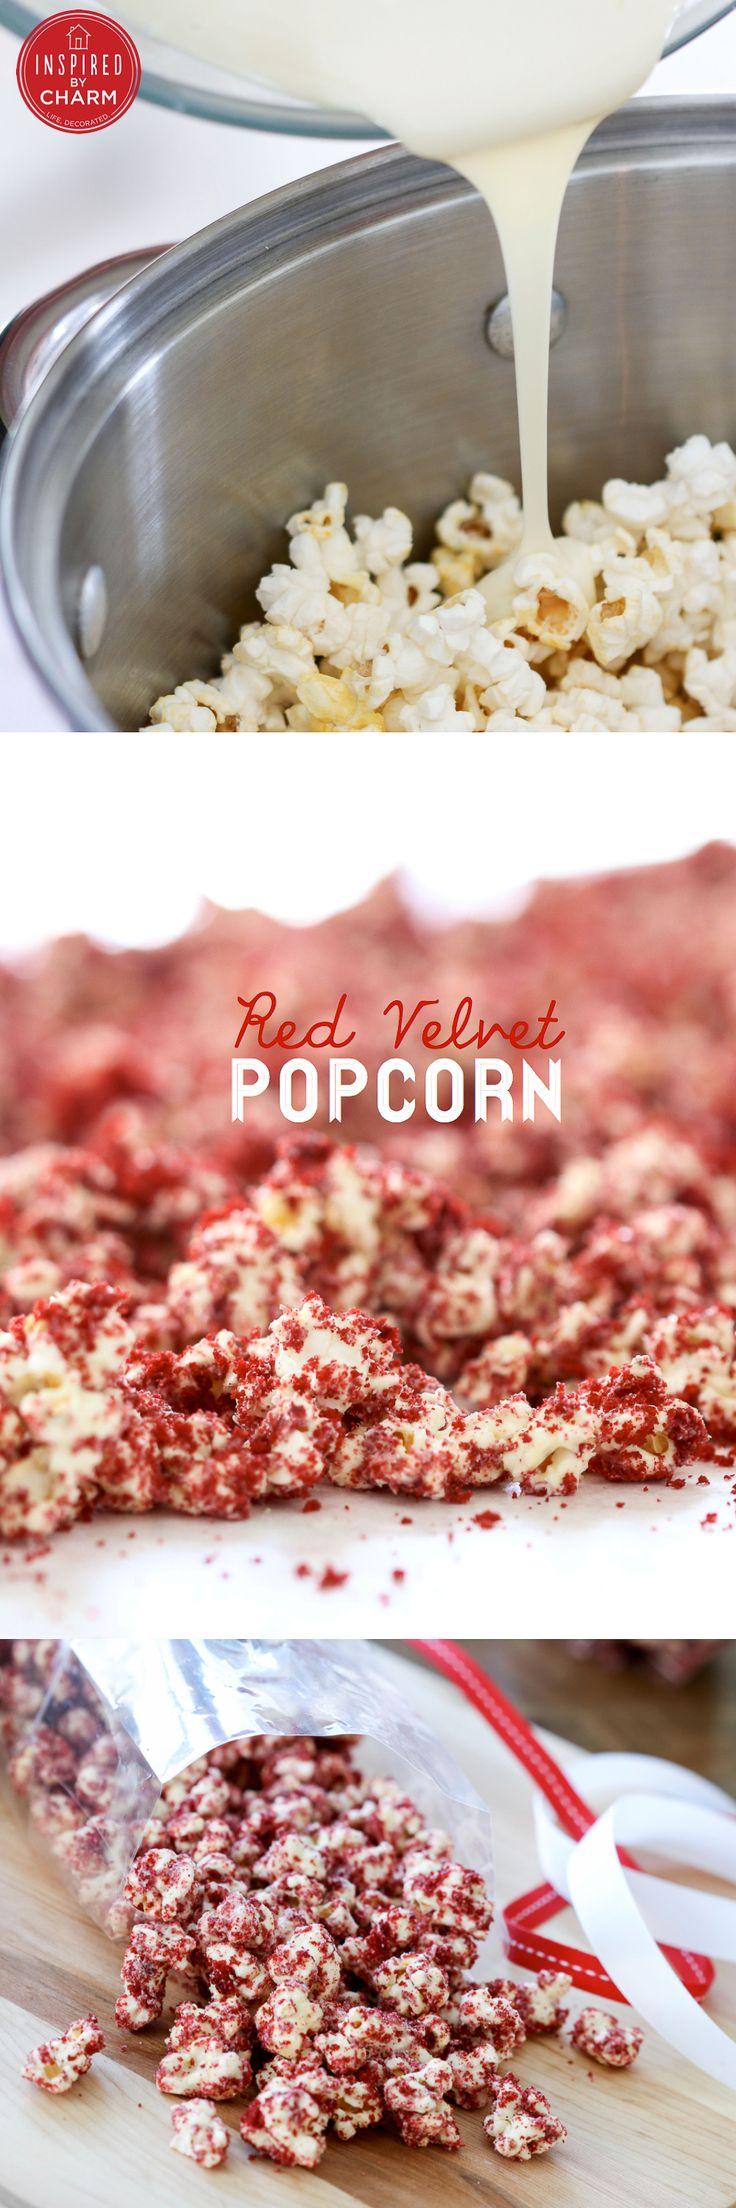 Red Velvet Popcorn! @Alice Tarr @Erin Higgins @Sarah Moellman @Kimberly Summers for valentines dayyyyy!!!